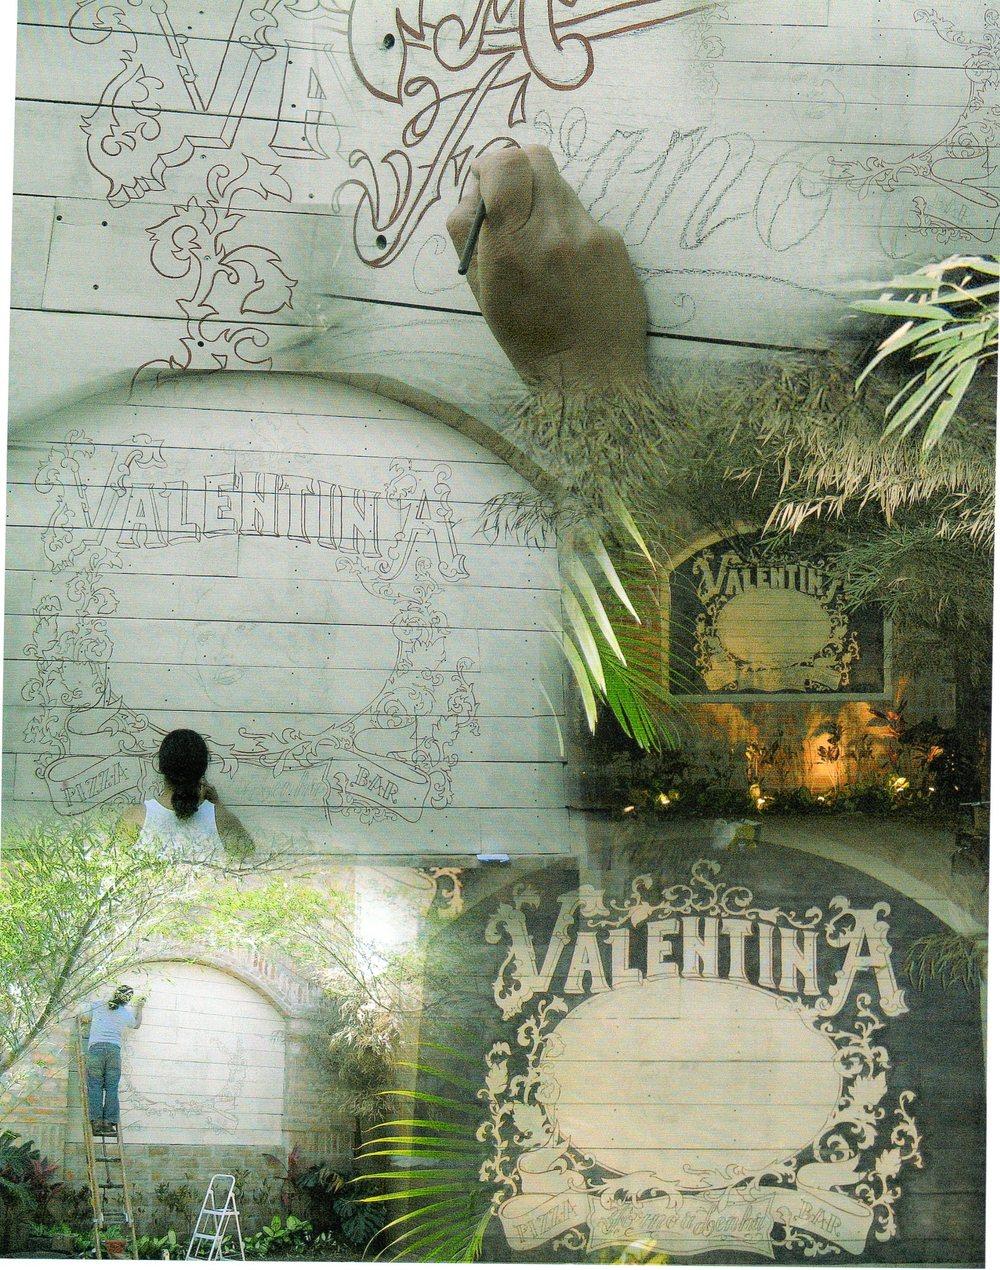 Valentina artwork by carlos painting a wall1.jpg